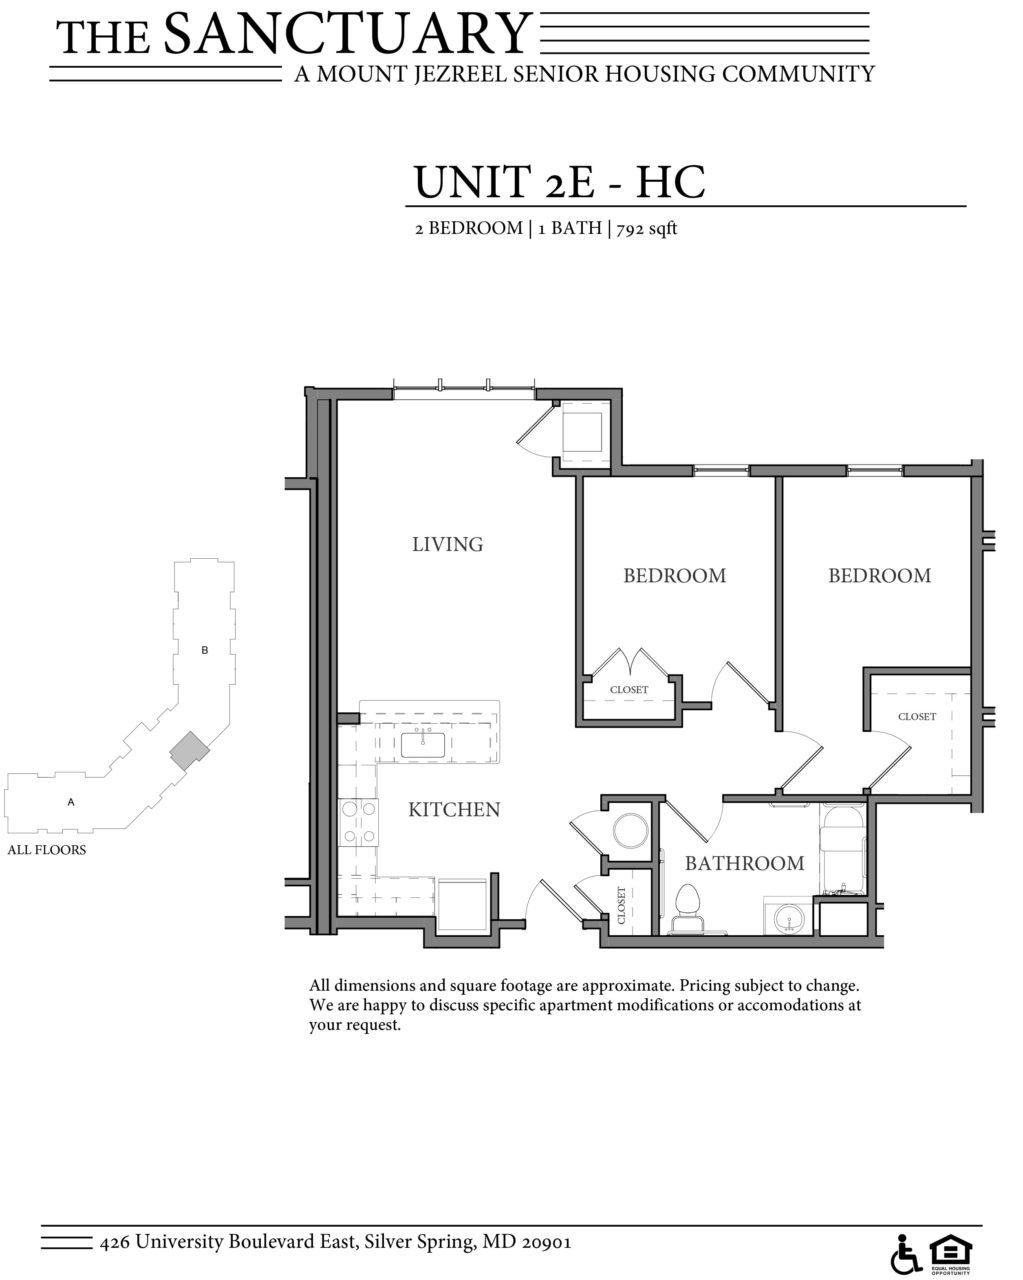 The Sanctuary, a Mount Jezreel Senior Housing